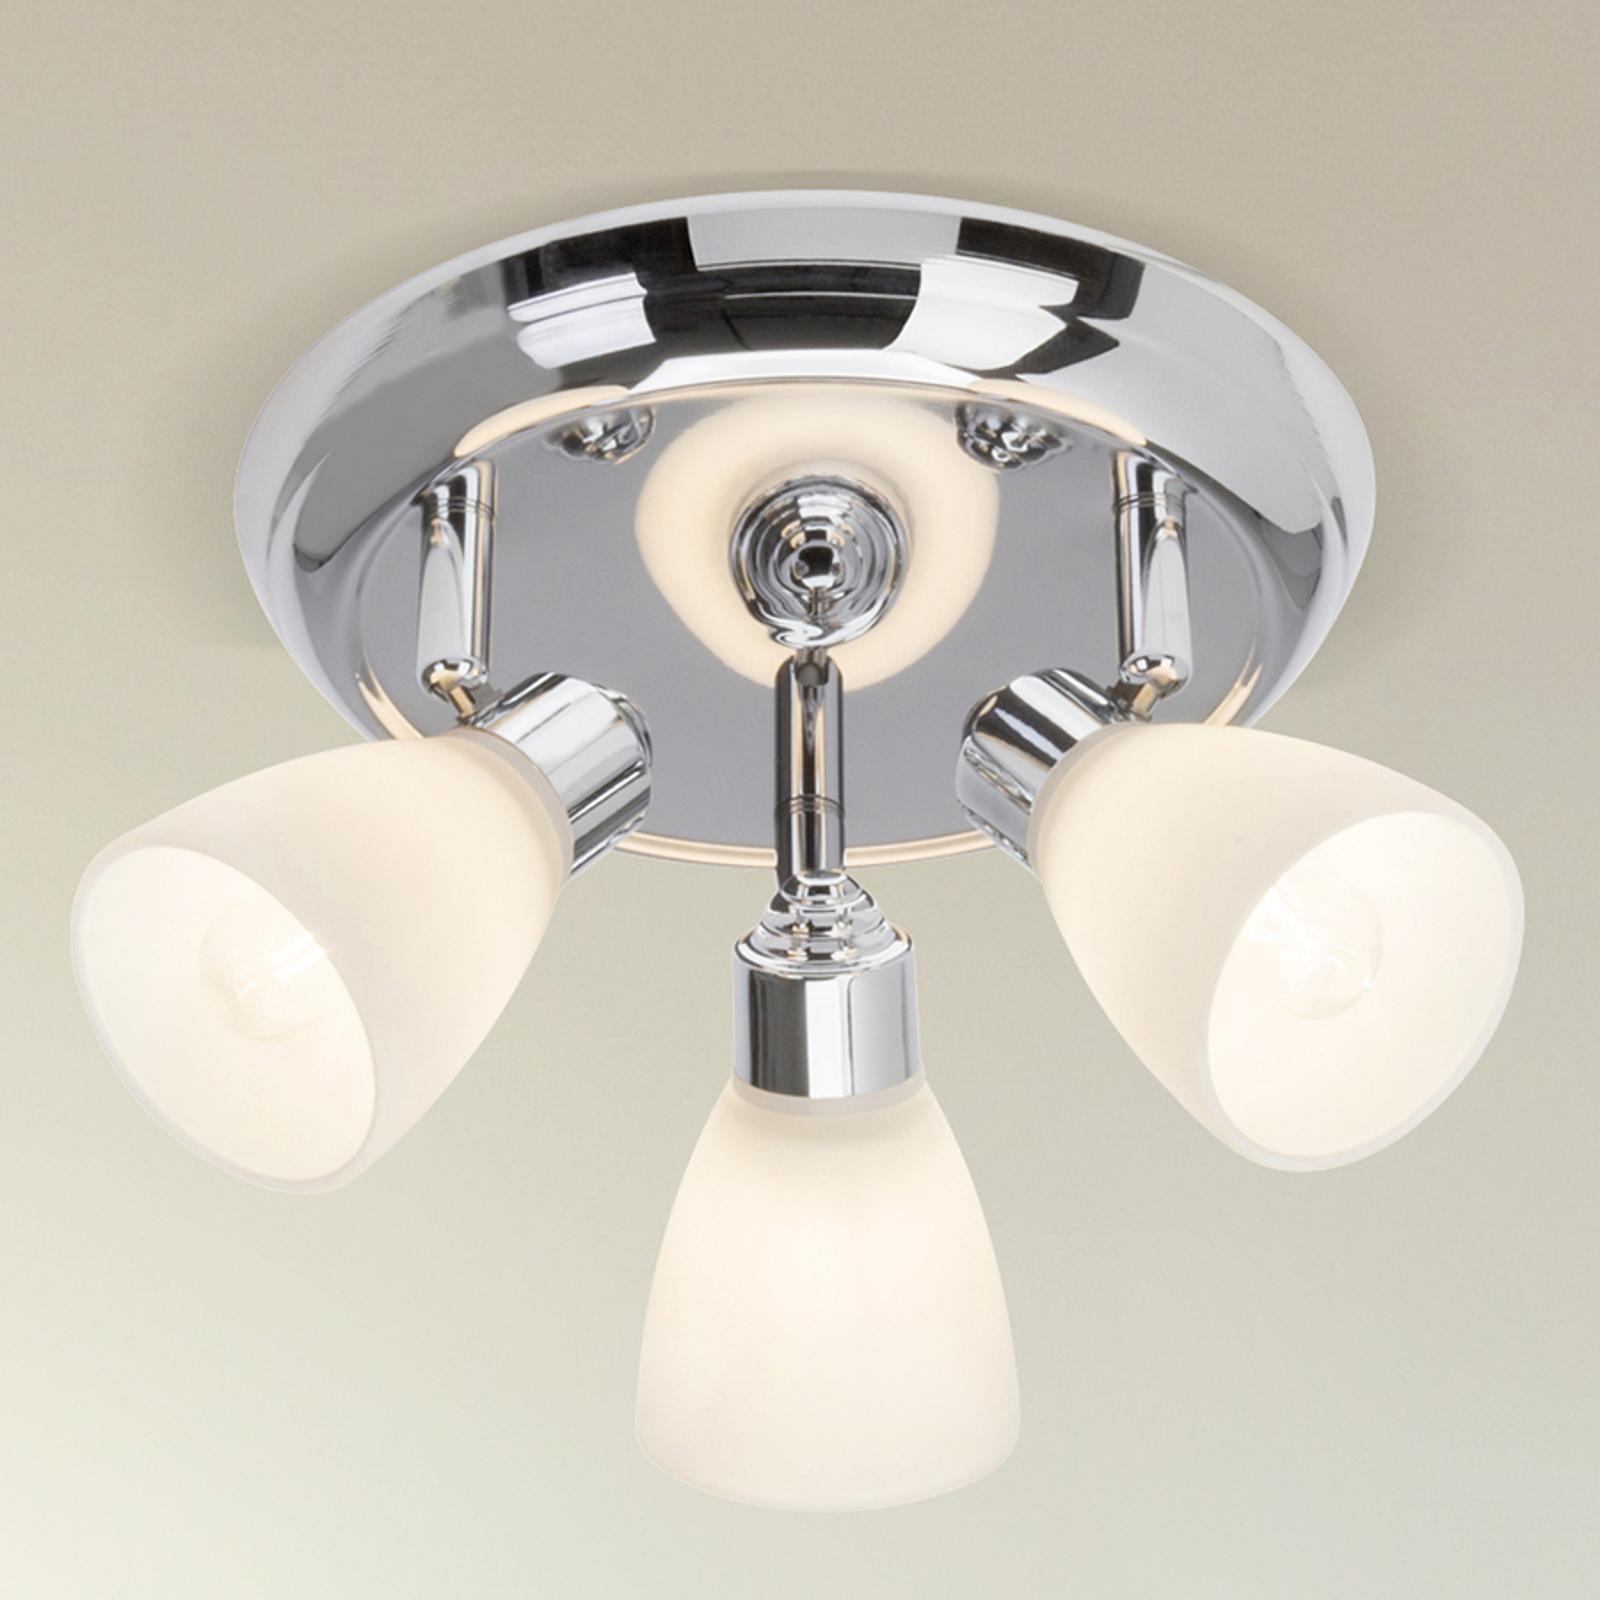 Kensington - loftlampe, krom med tre lyskilder